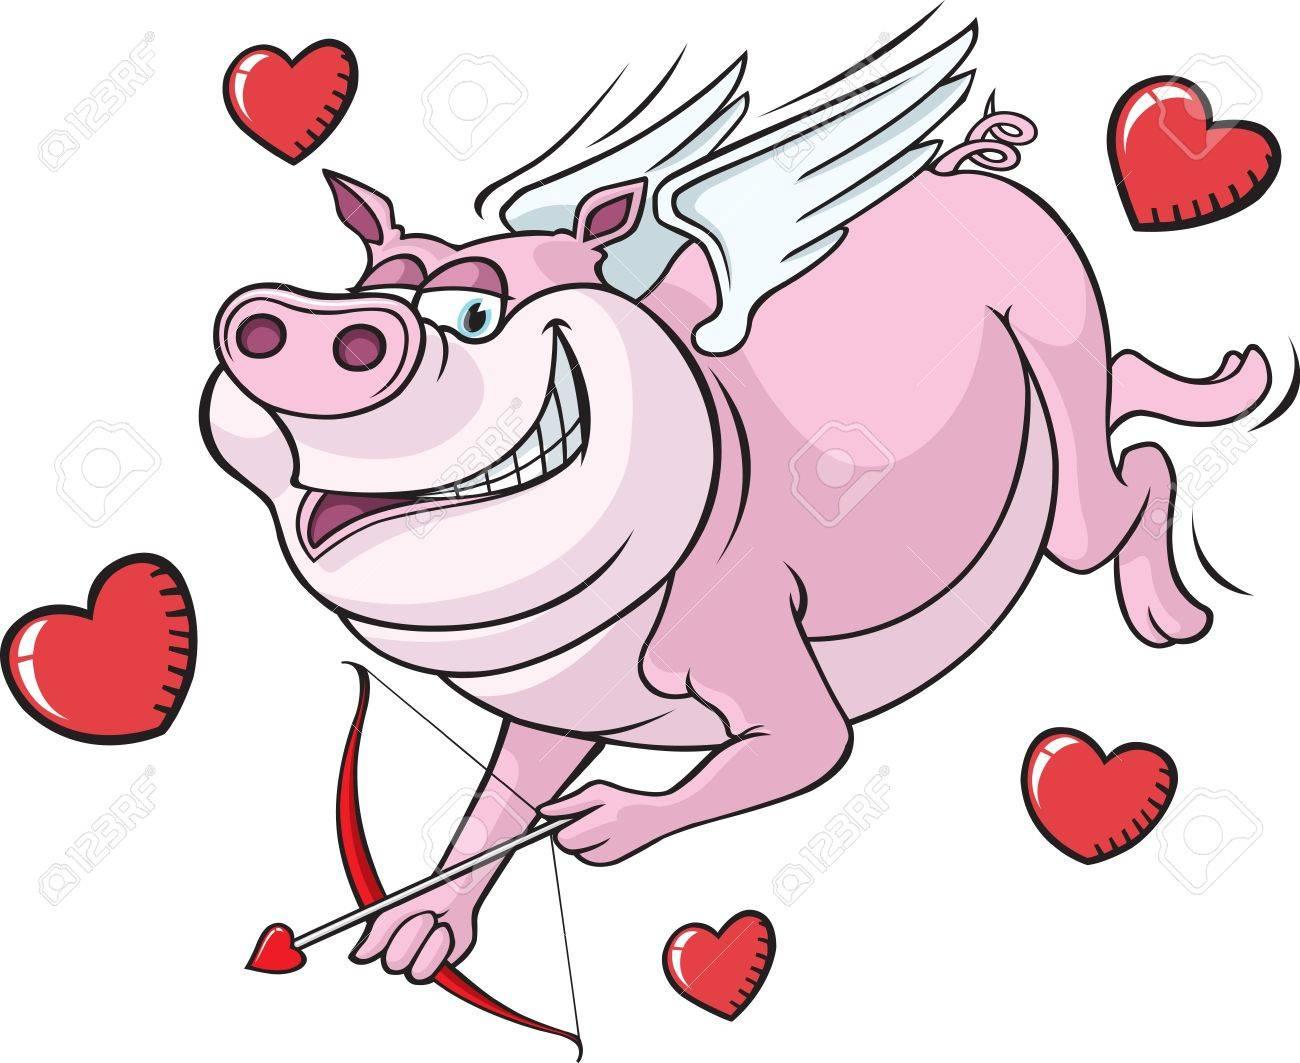 Cartoon Flying Pig Cupid  Vector file Stock Vector - 16493448